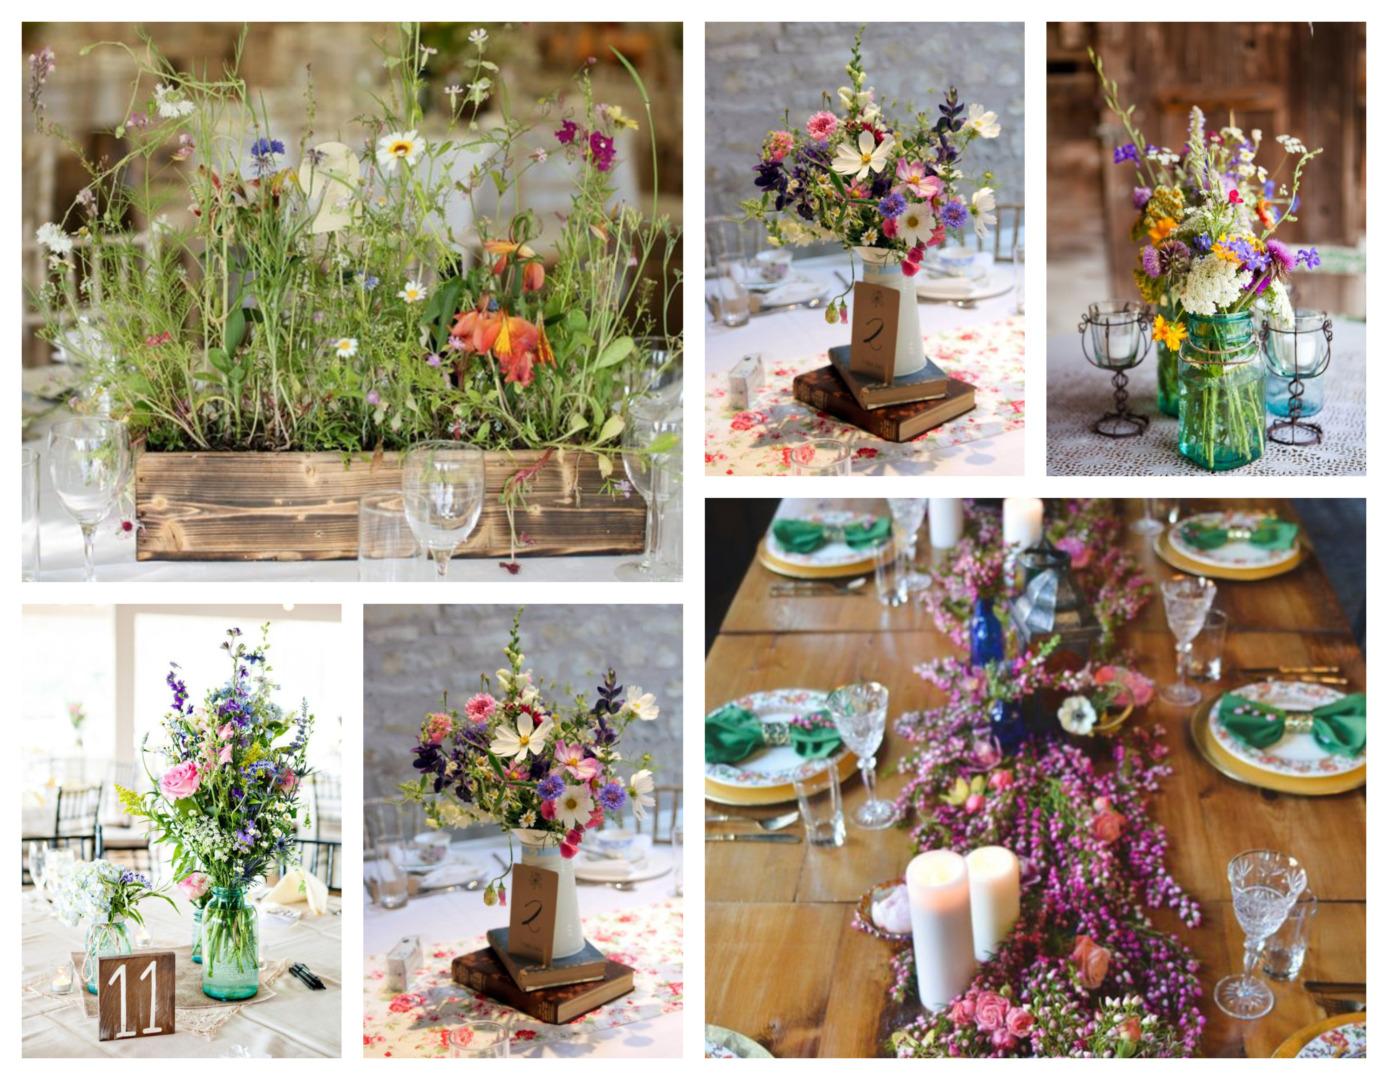 wildflower wedding theme - co-ordination made easy